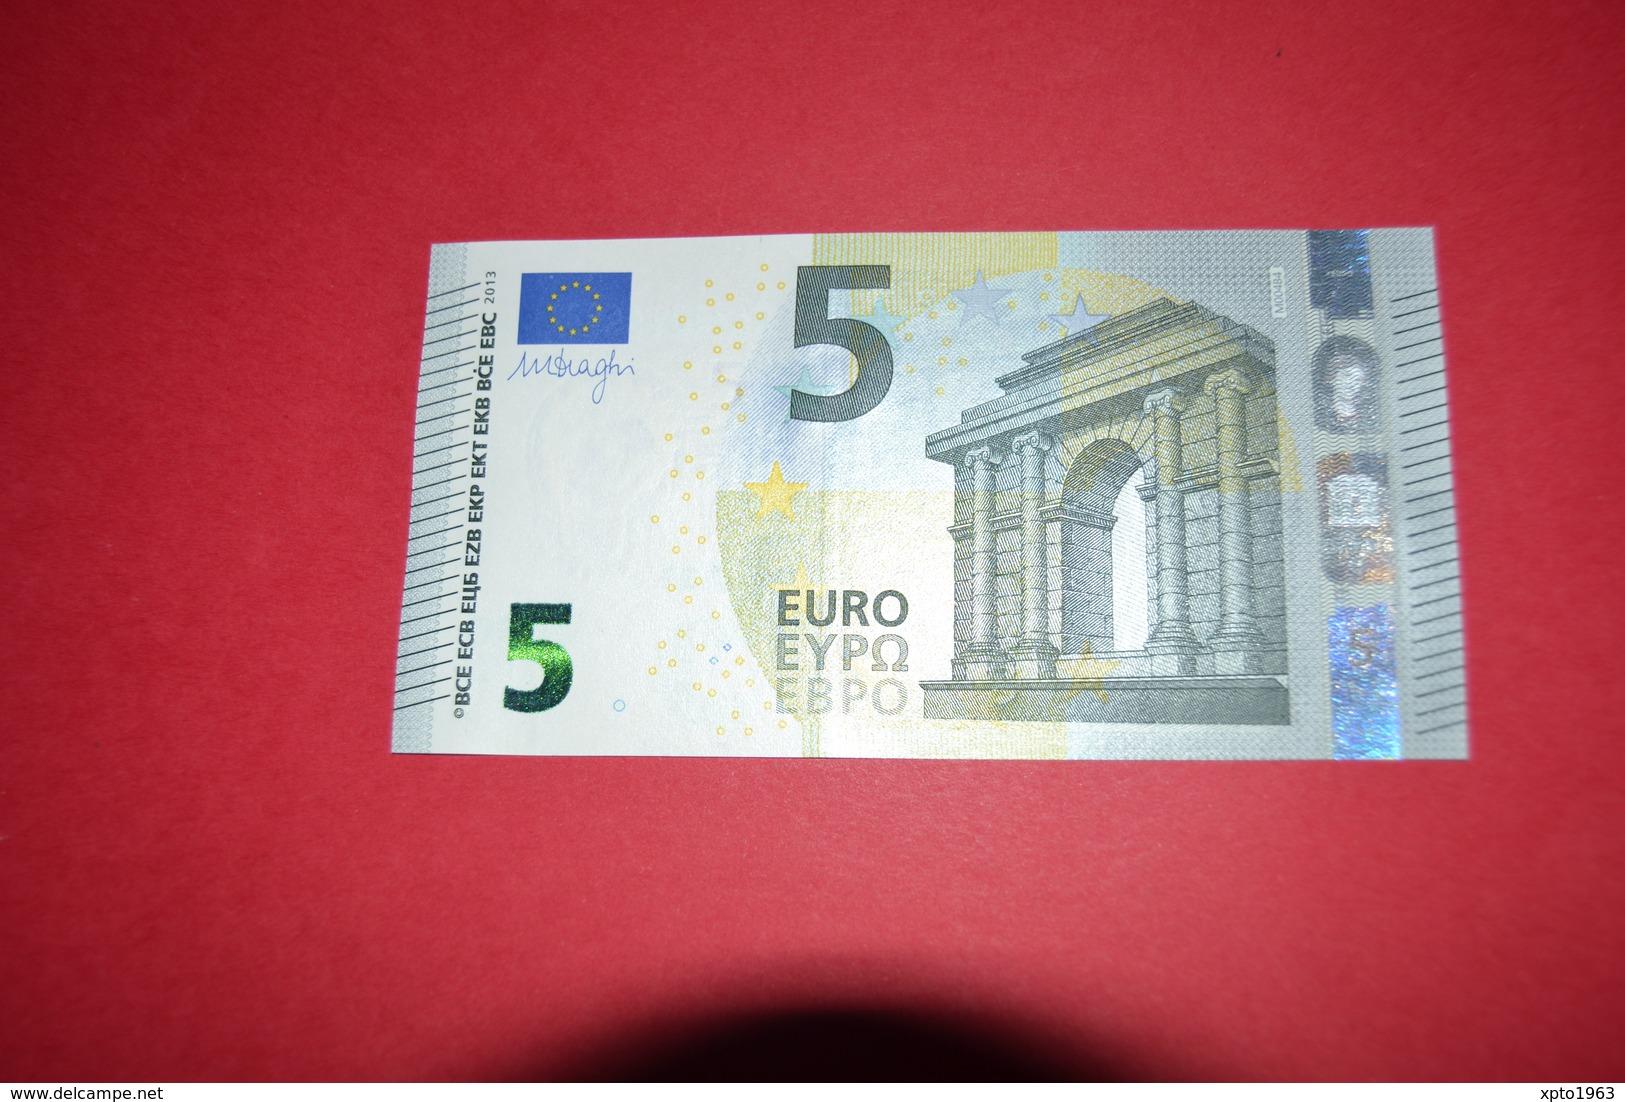 5 EURO M004 B4 PORTUGAL M004B4 - Serial Number MA2181669248 - UNC FDS NEUF - EURO